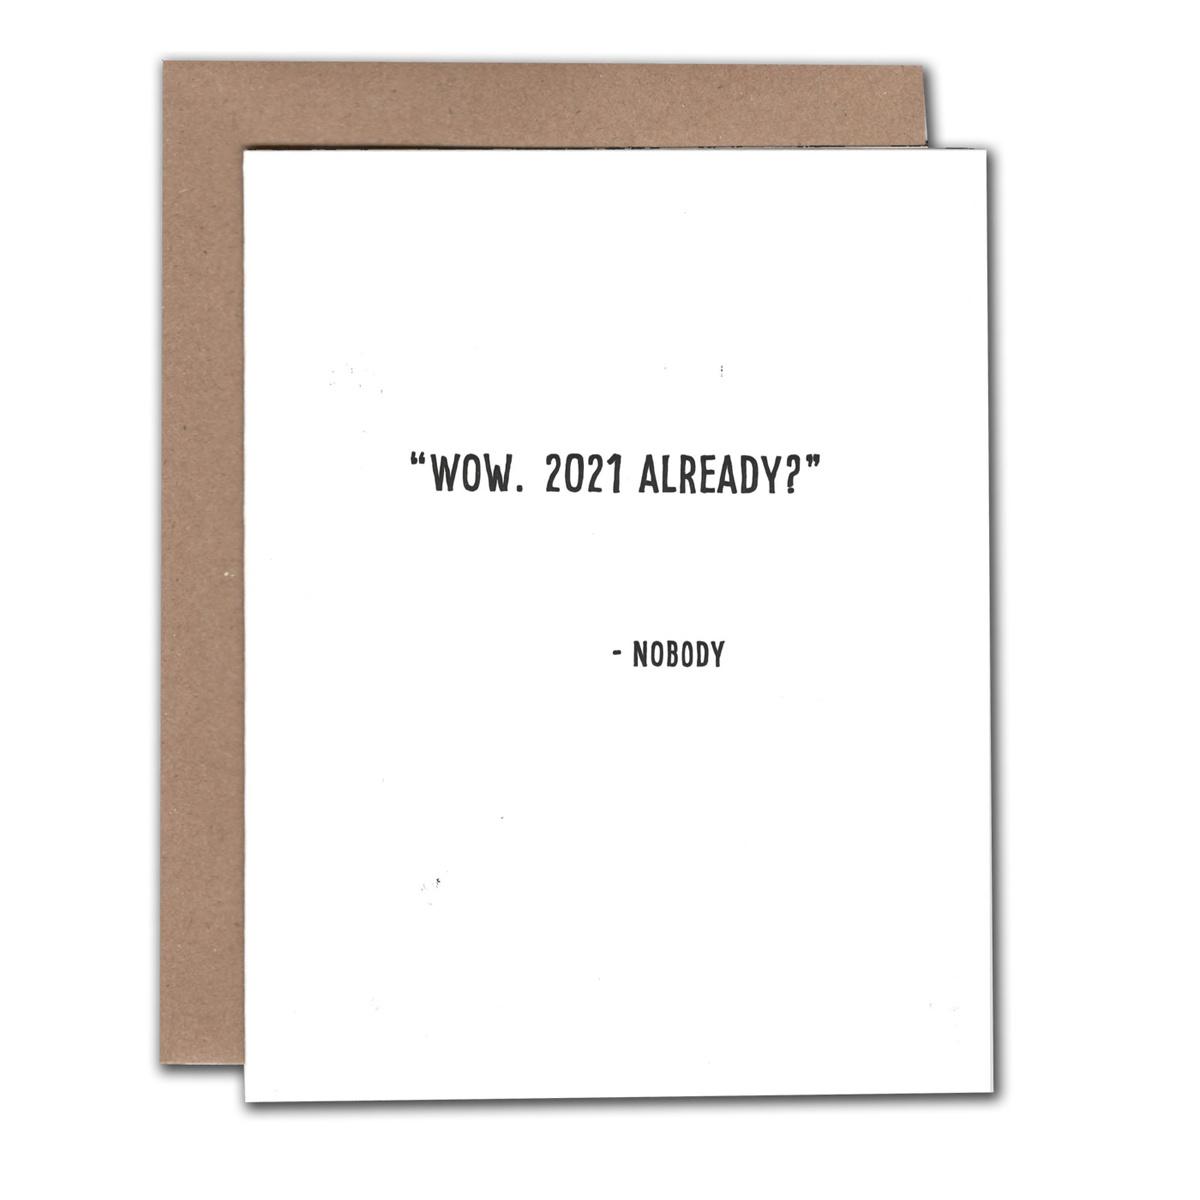 Power and Light Letterpress - PLL Wow 2021 Already